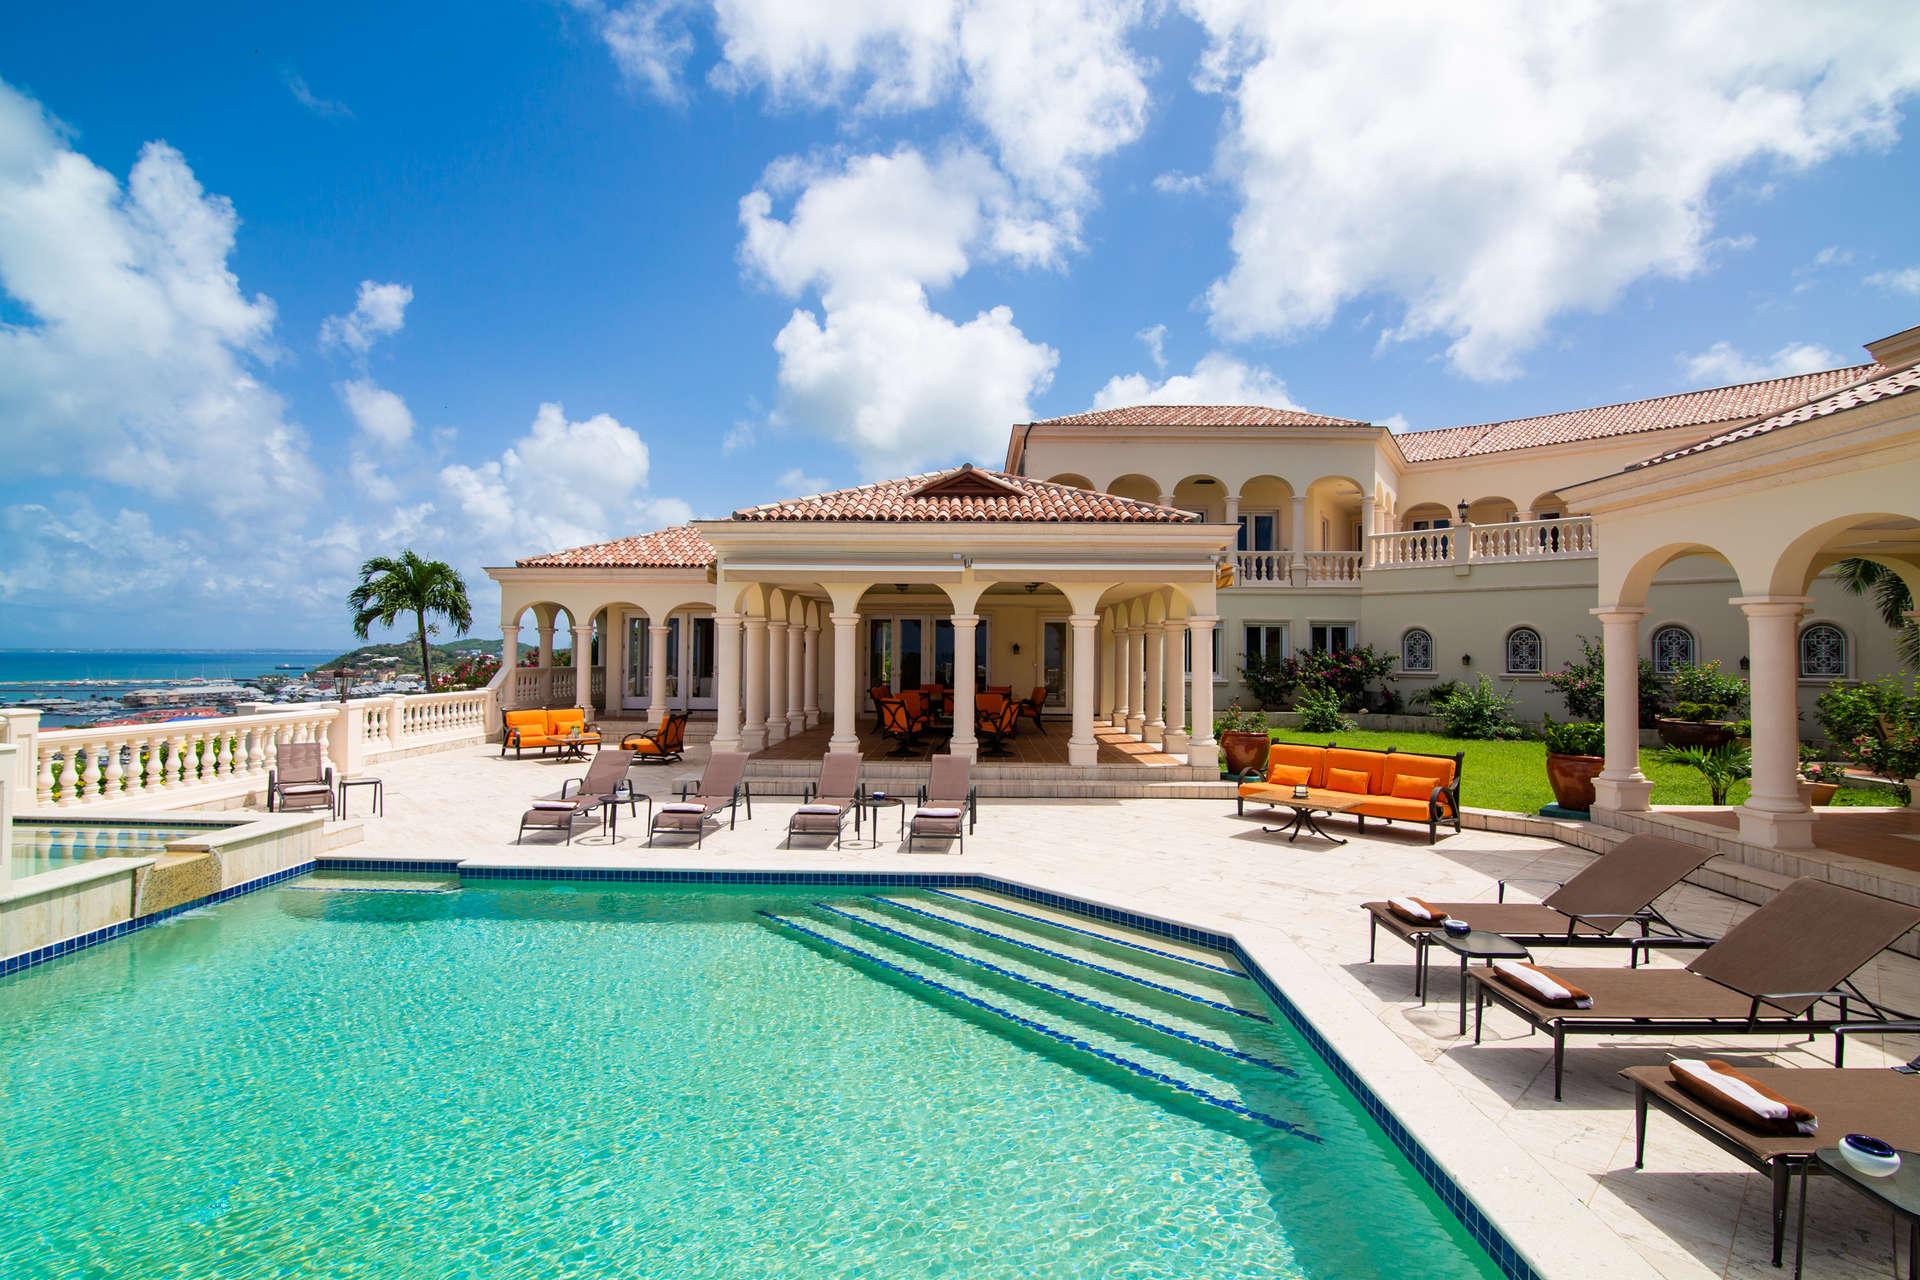 Luxury villa rentals caribbean - St martin - Saint martin french - Bellevue - Les Jardin de Bellevue - Image 1/23